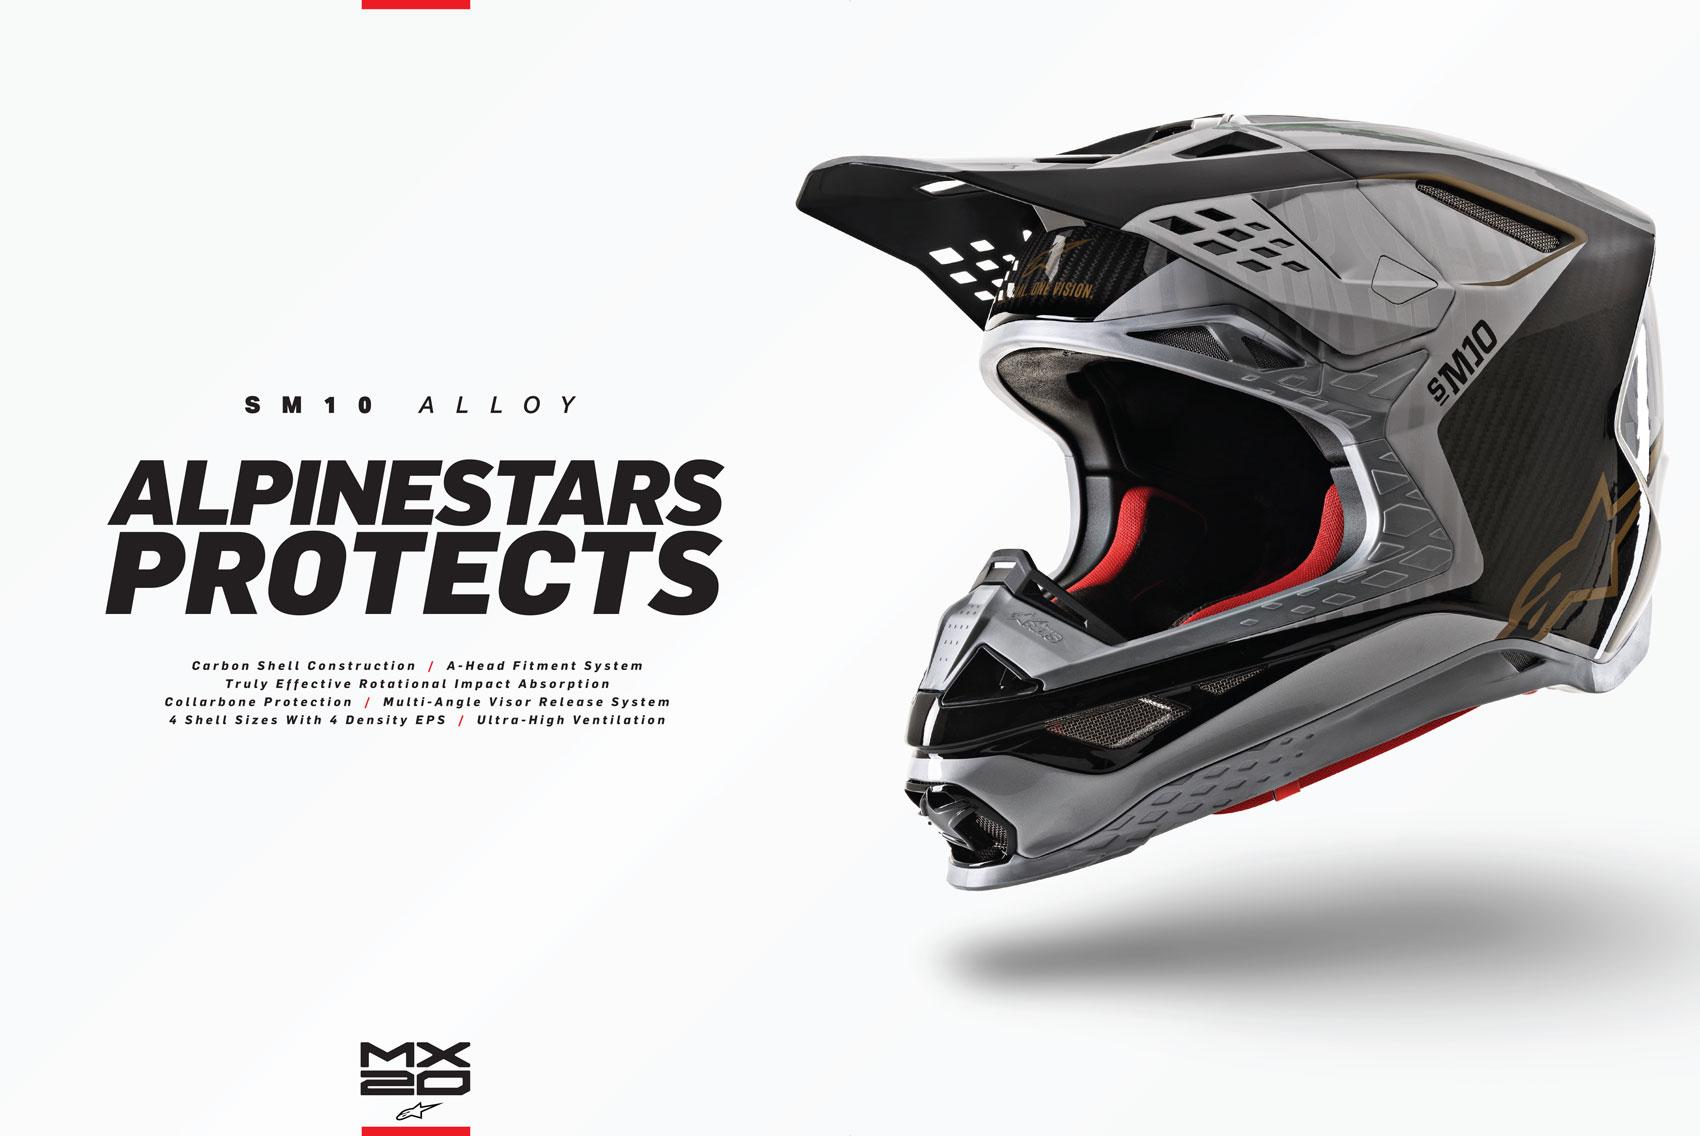 Racer X October 2019 - Alpine Stars Advertisement